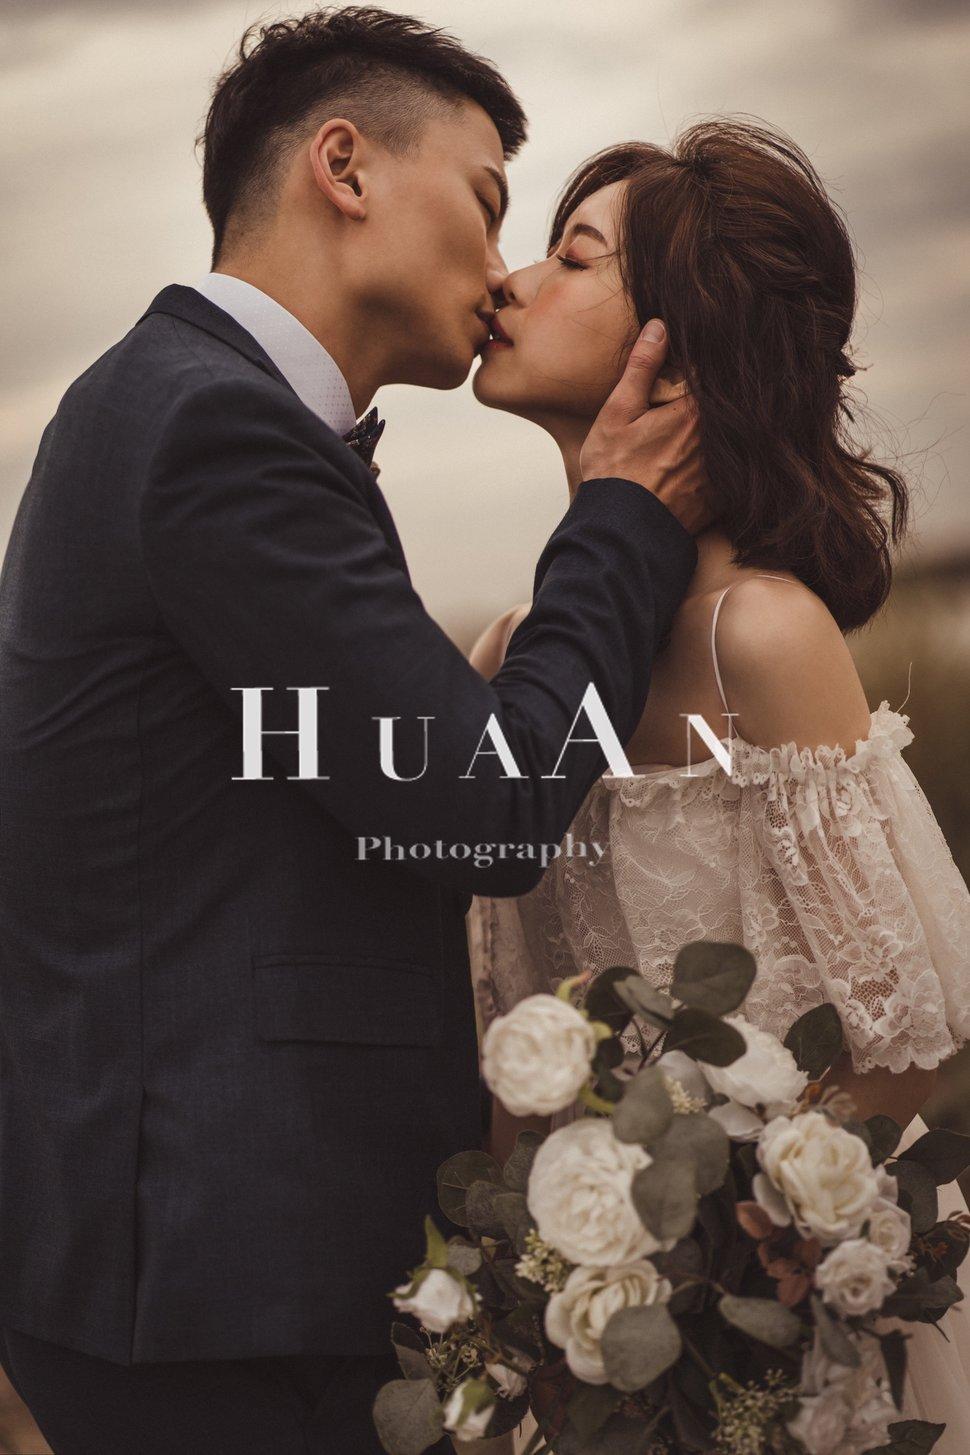 B03B9E47-F8A3-453F-AC0E-ACFD887209E3 - Huaan Photography《結婚吧》